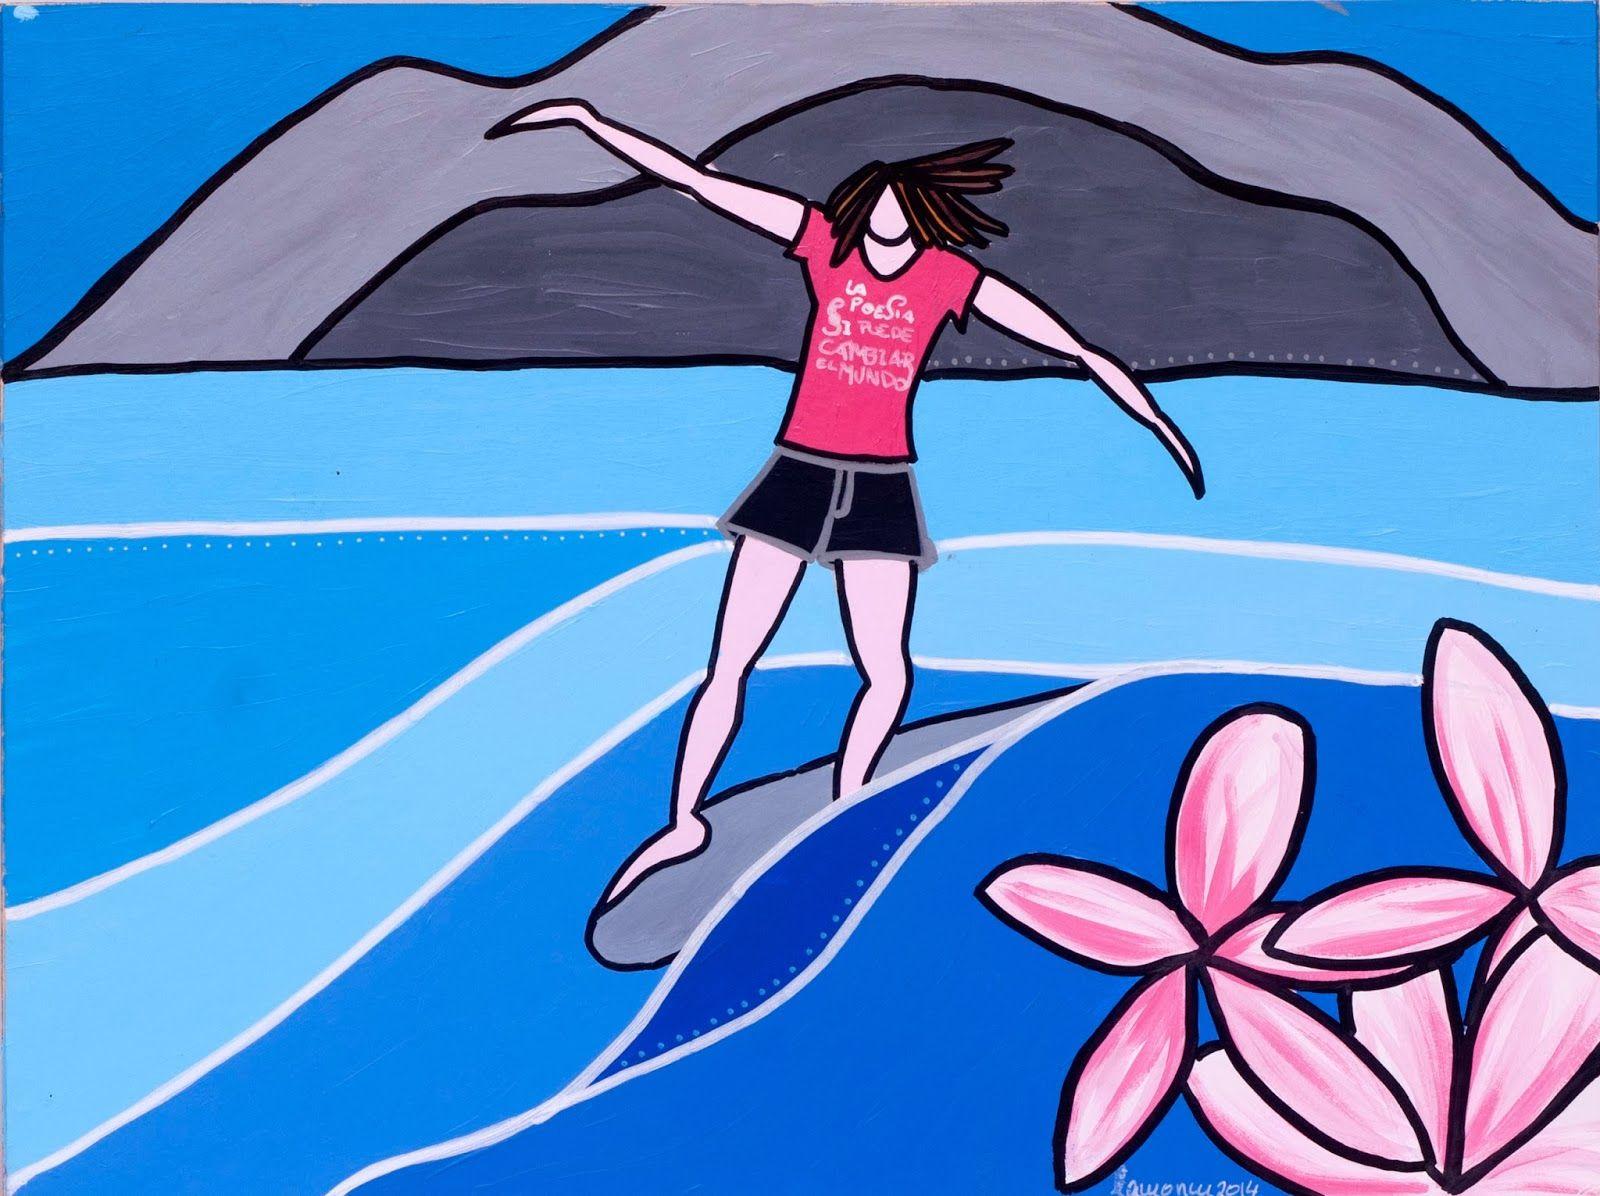 the poet by lamoncu  #surf #art #surfing #painting #drawing #waves #longboard #sea #surfer #artist #paint #artwork #jocreo #posca